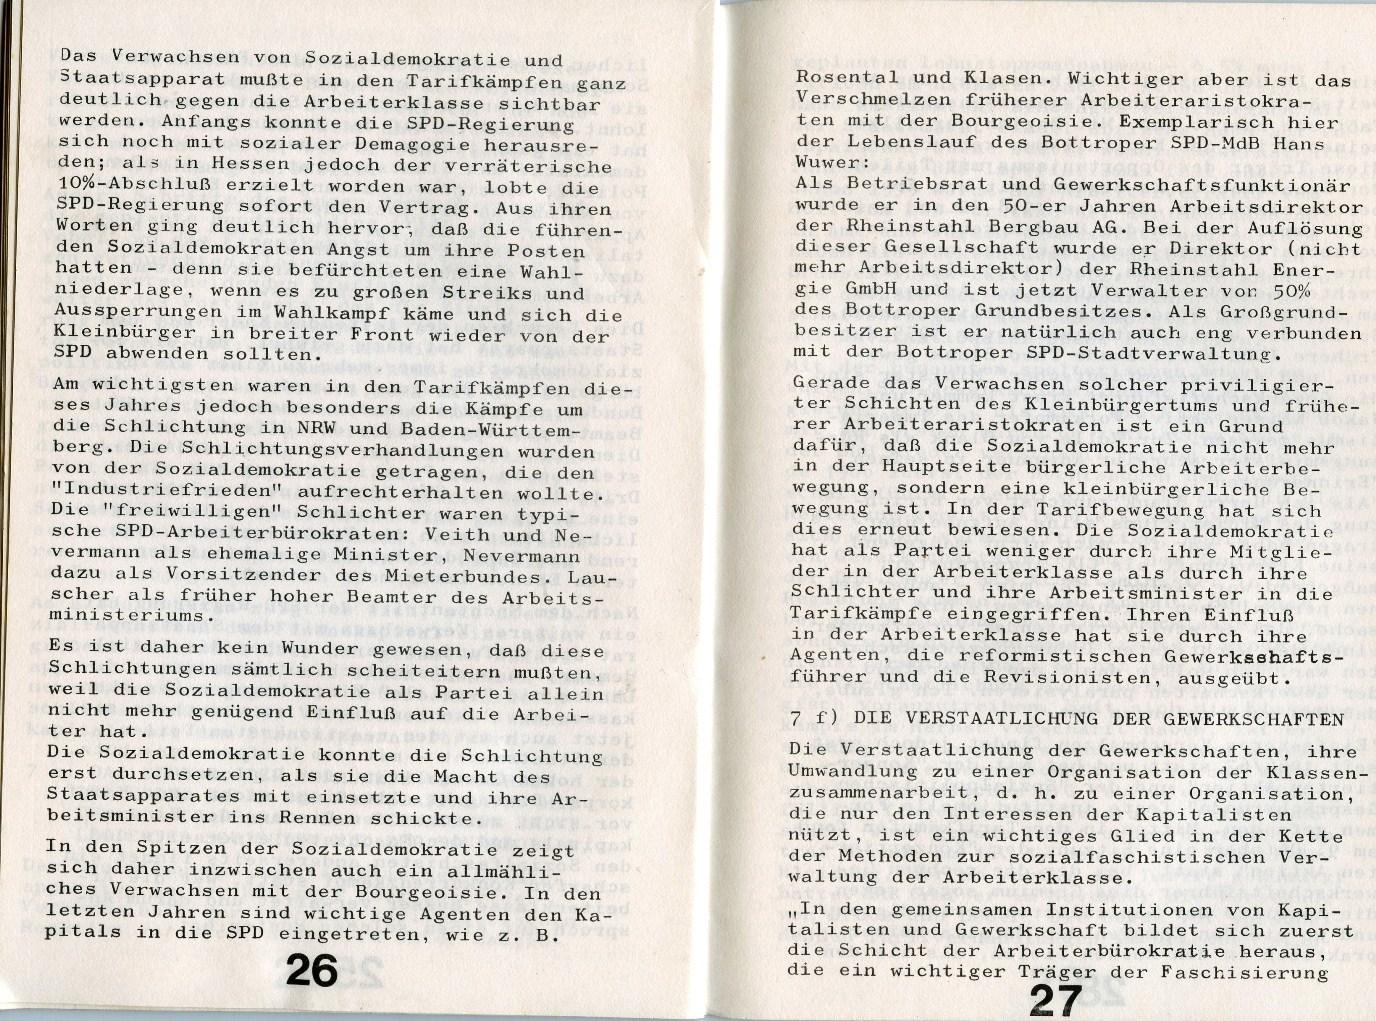 KJVD_Sozialdemokratie_Sozialfaschismus_1971_15